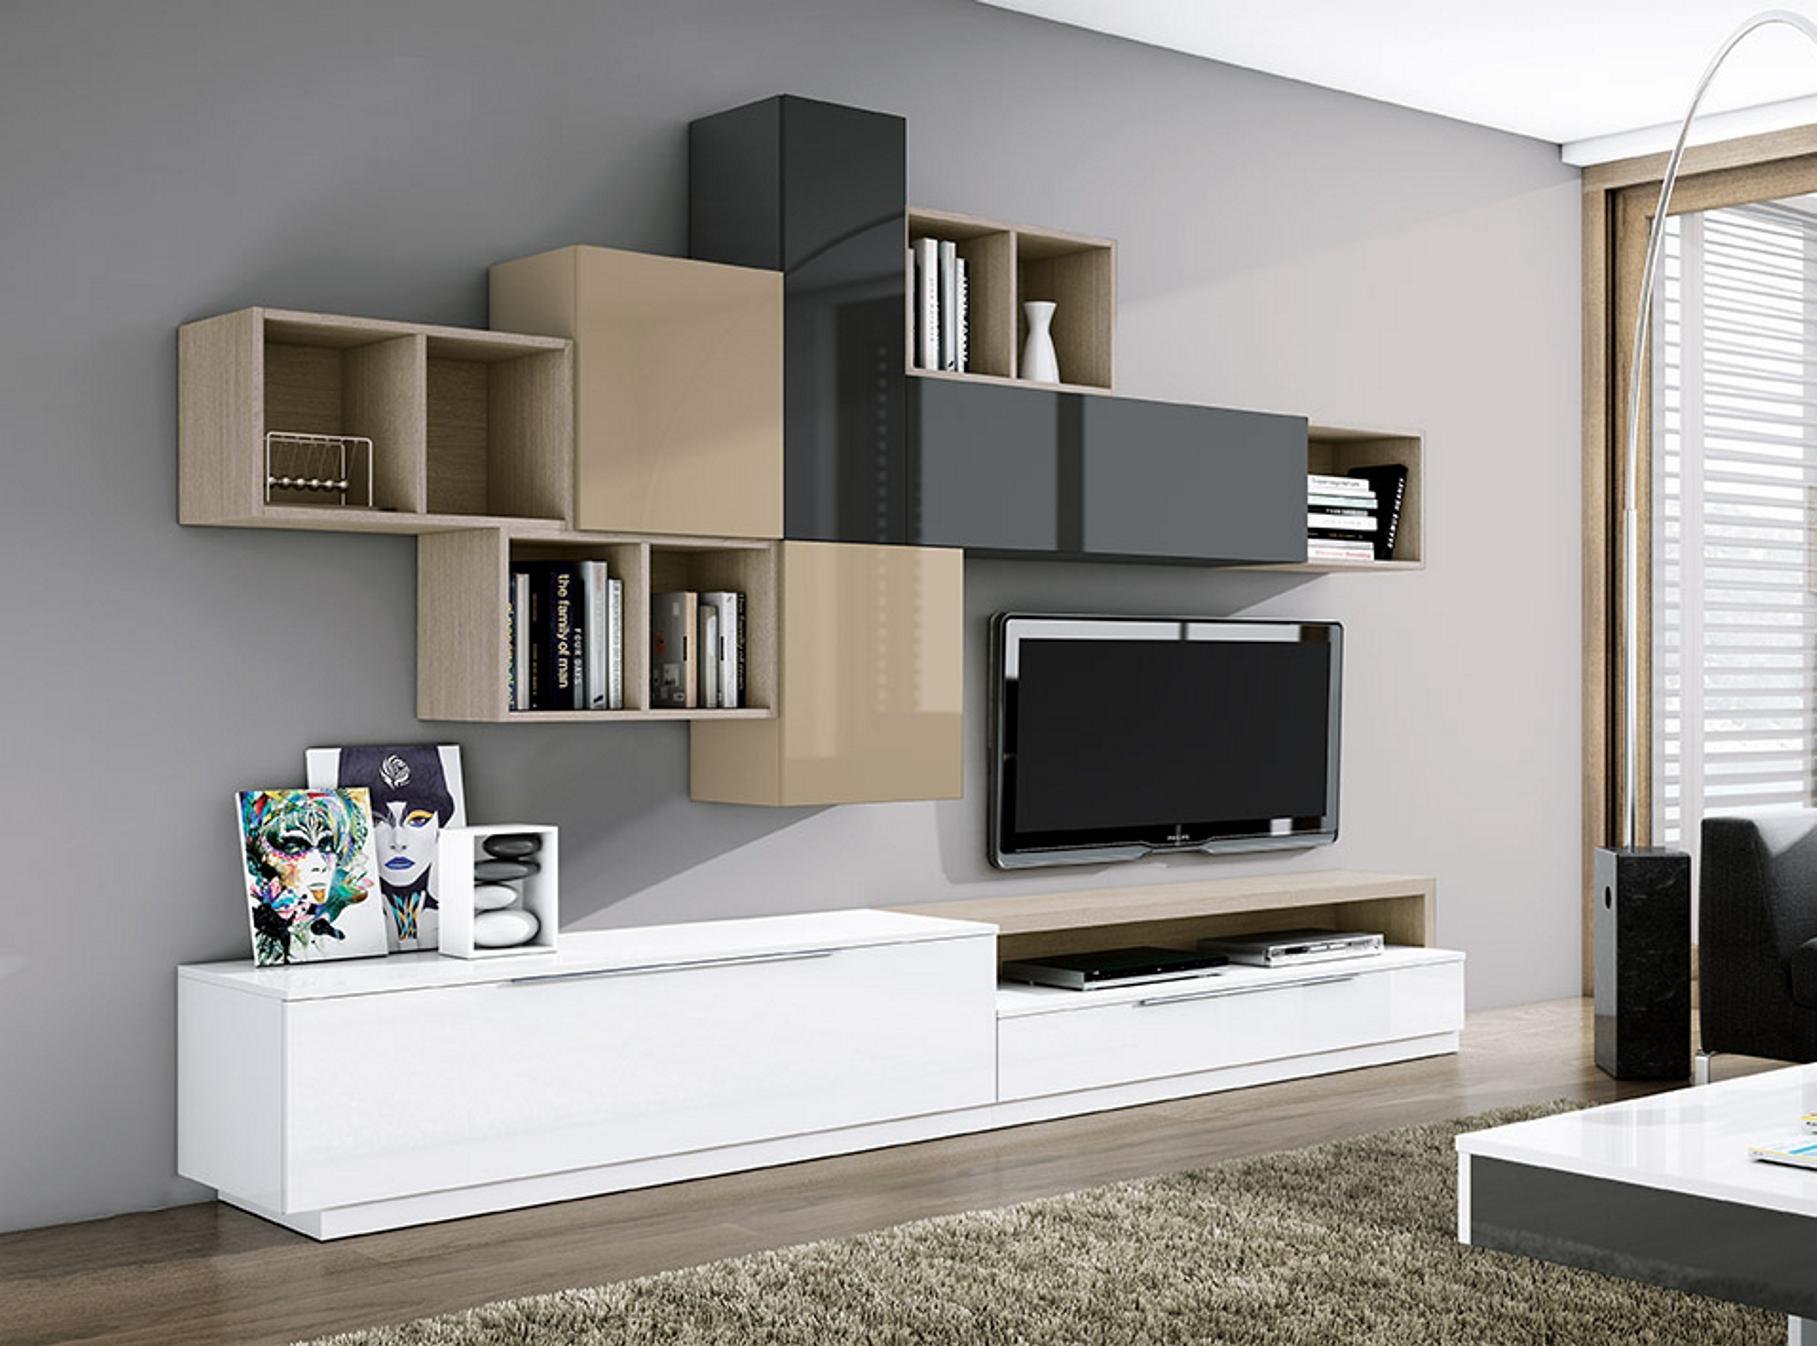 salon-moderno-Zion-3.0-muebles-paco-caballero-0907-5c8d32e310768